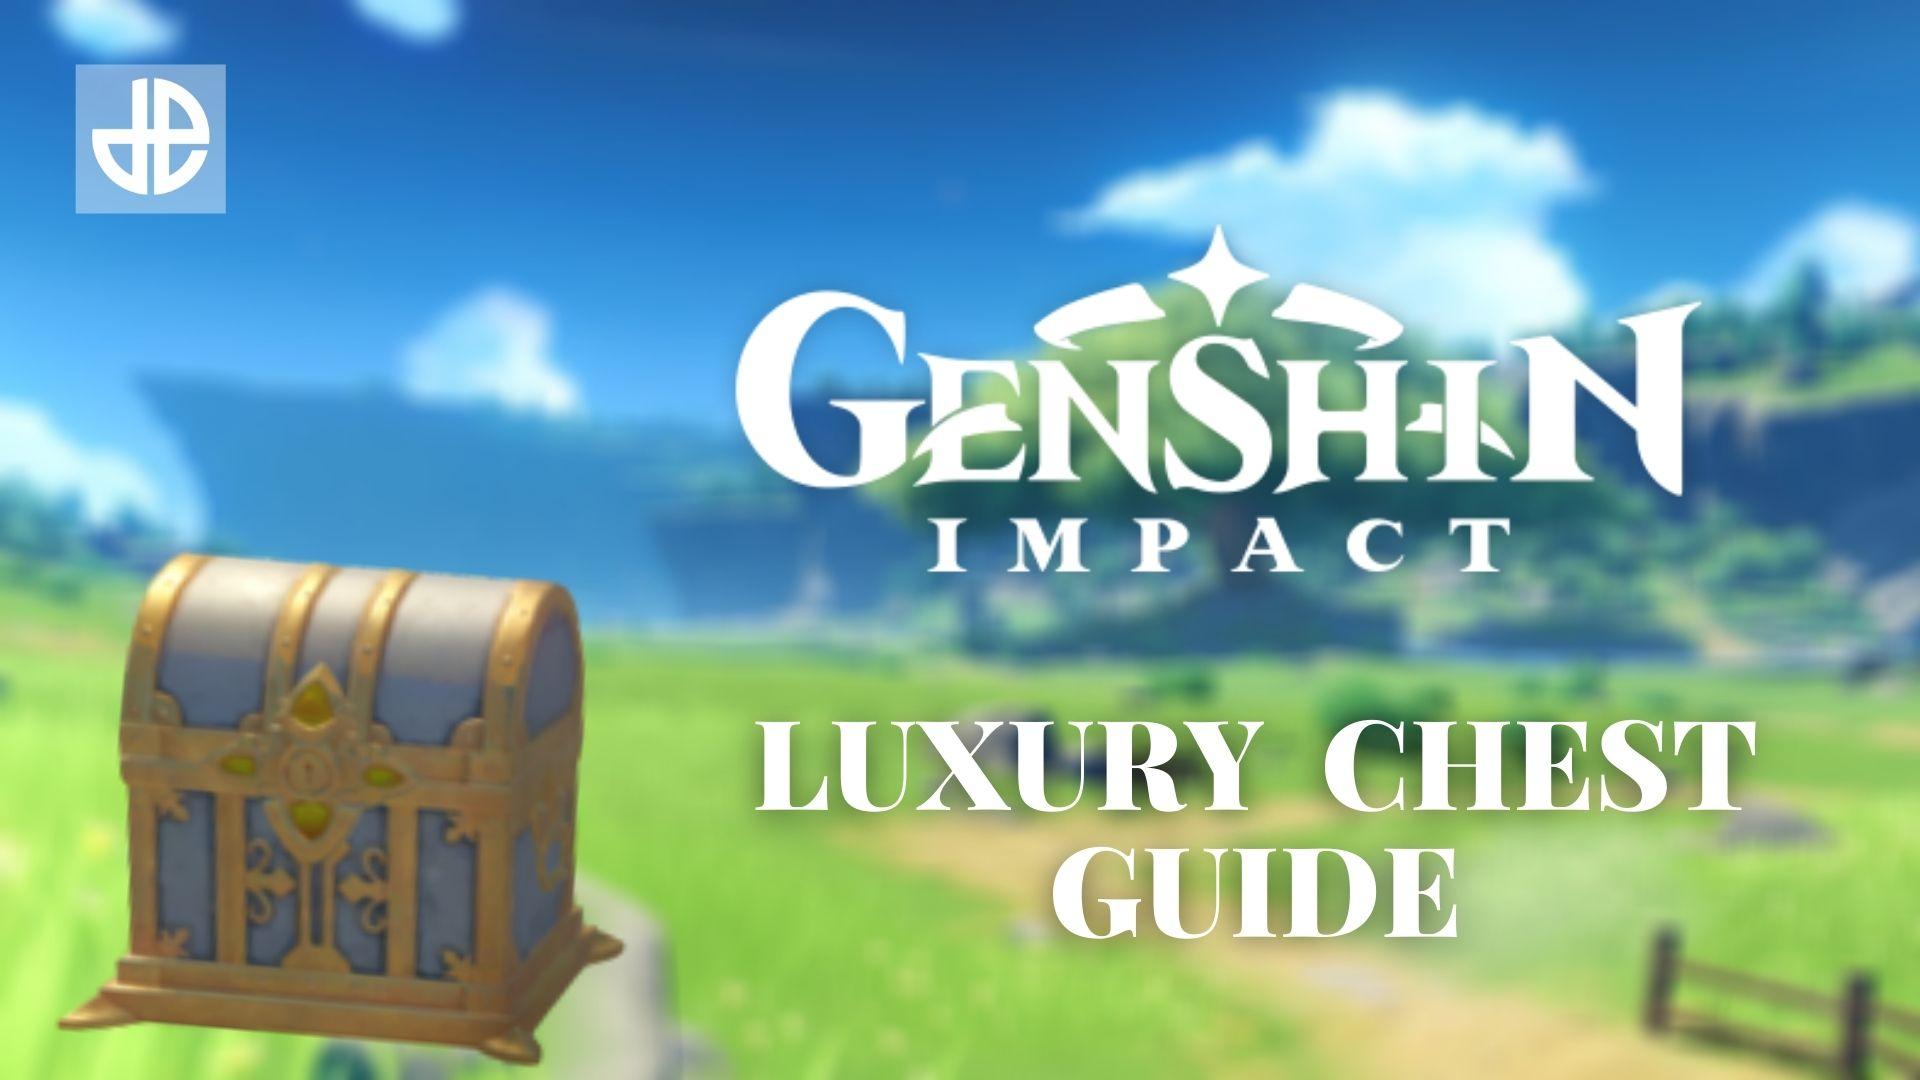 Genshin Impact Luxurious Chest